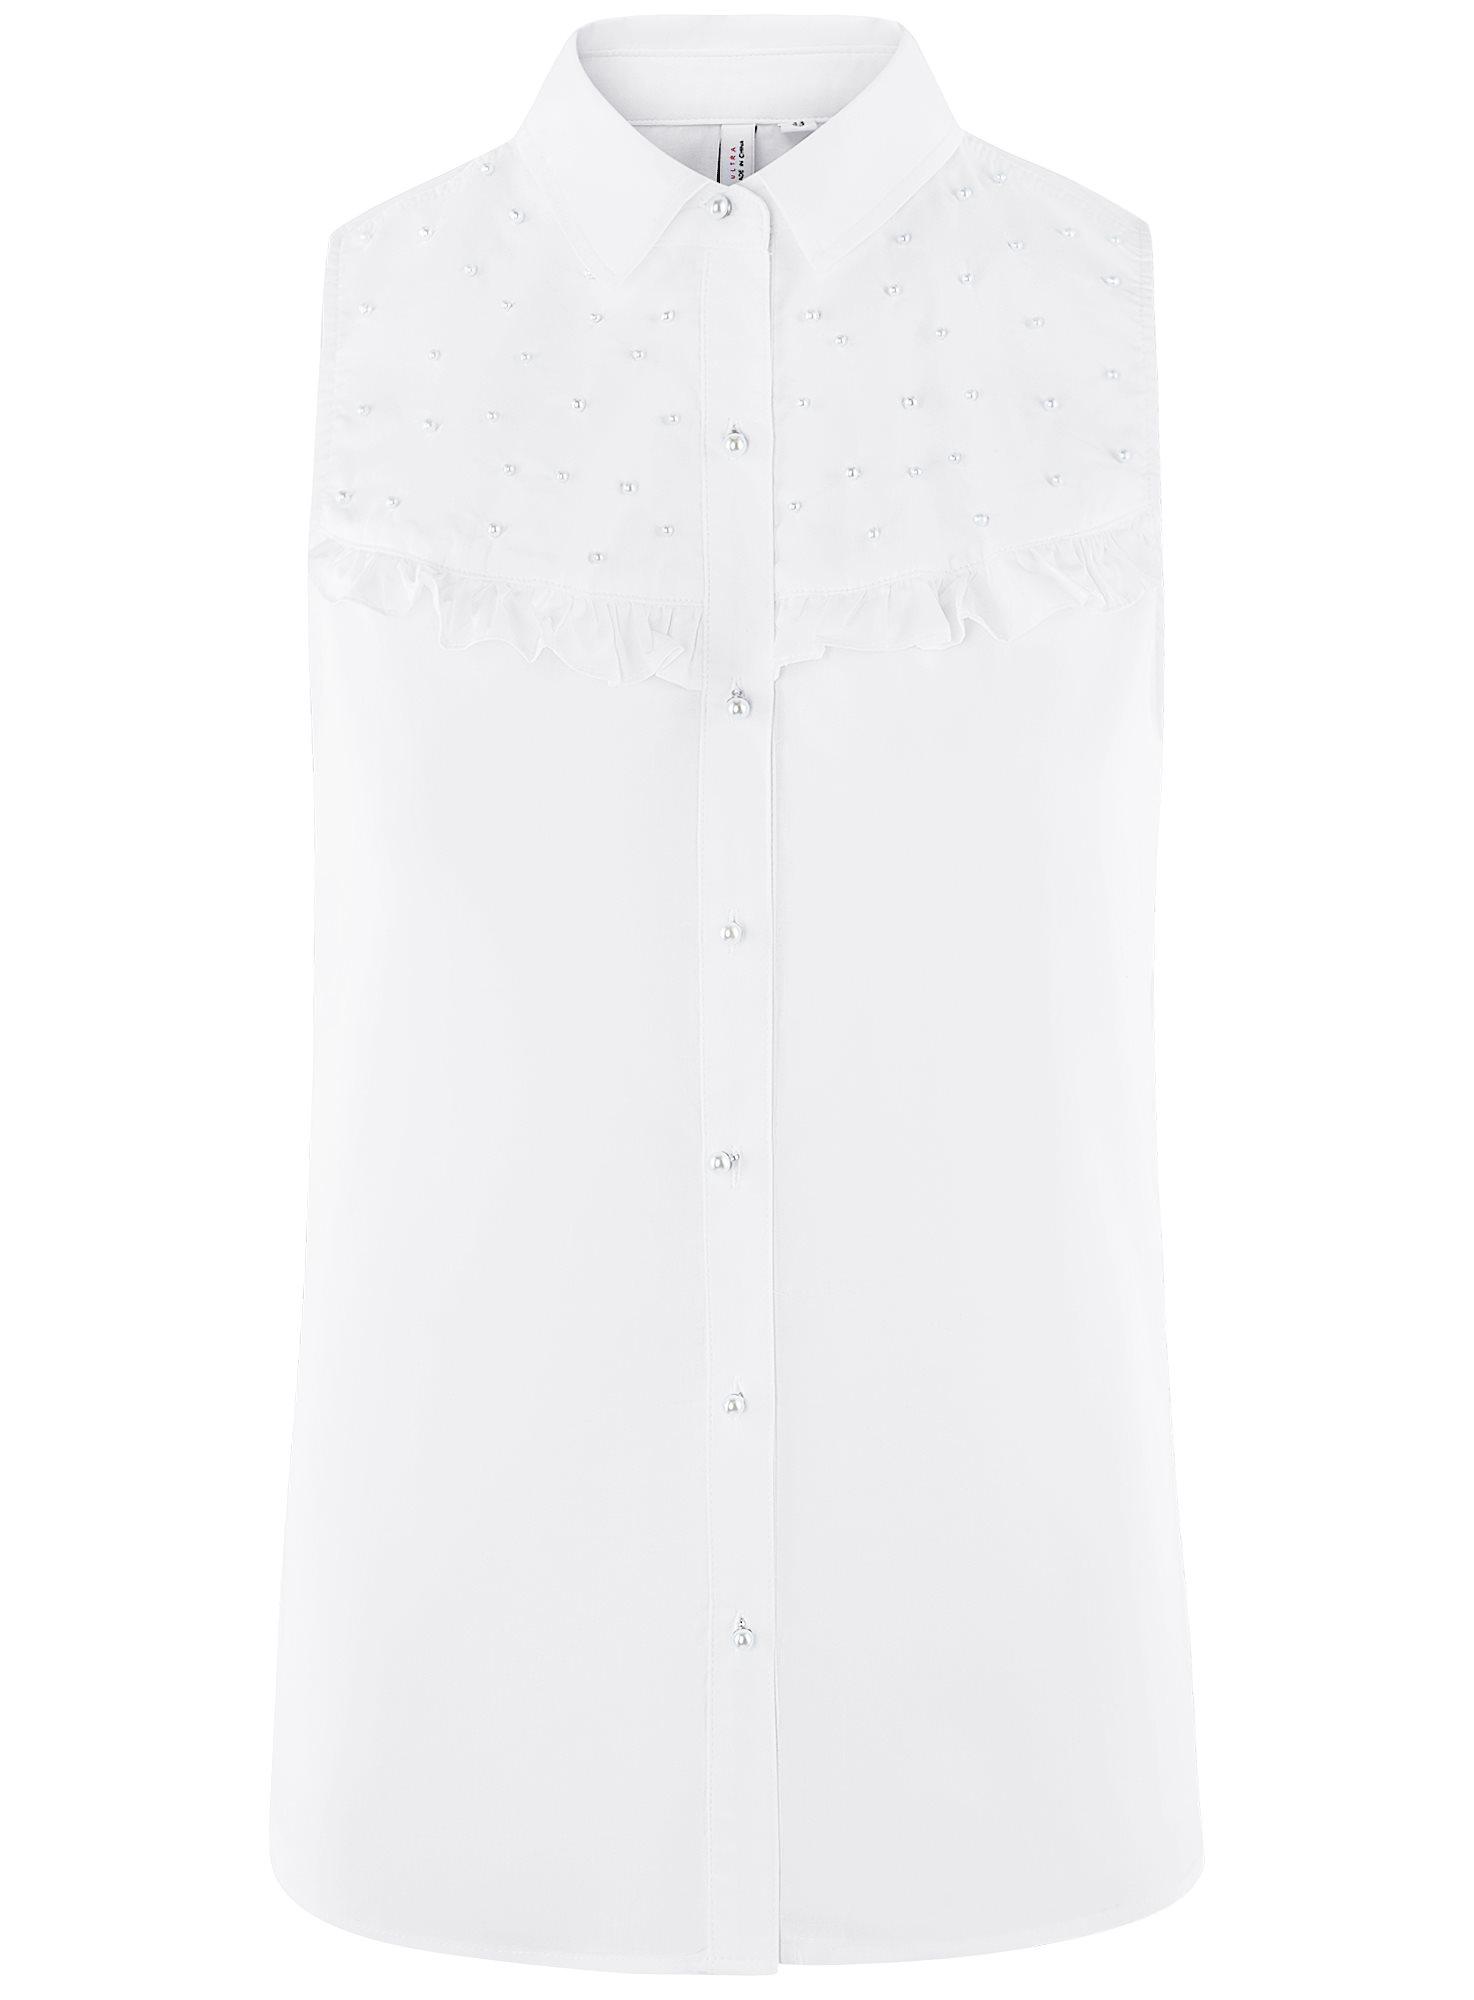 Топ хлопковый с рюшами oodji для женщины (белый), 14911013-1/13175N/1000N